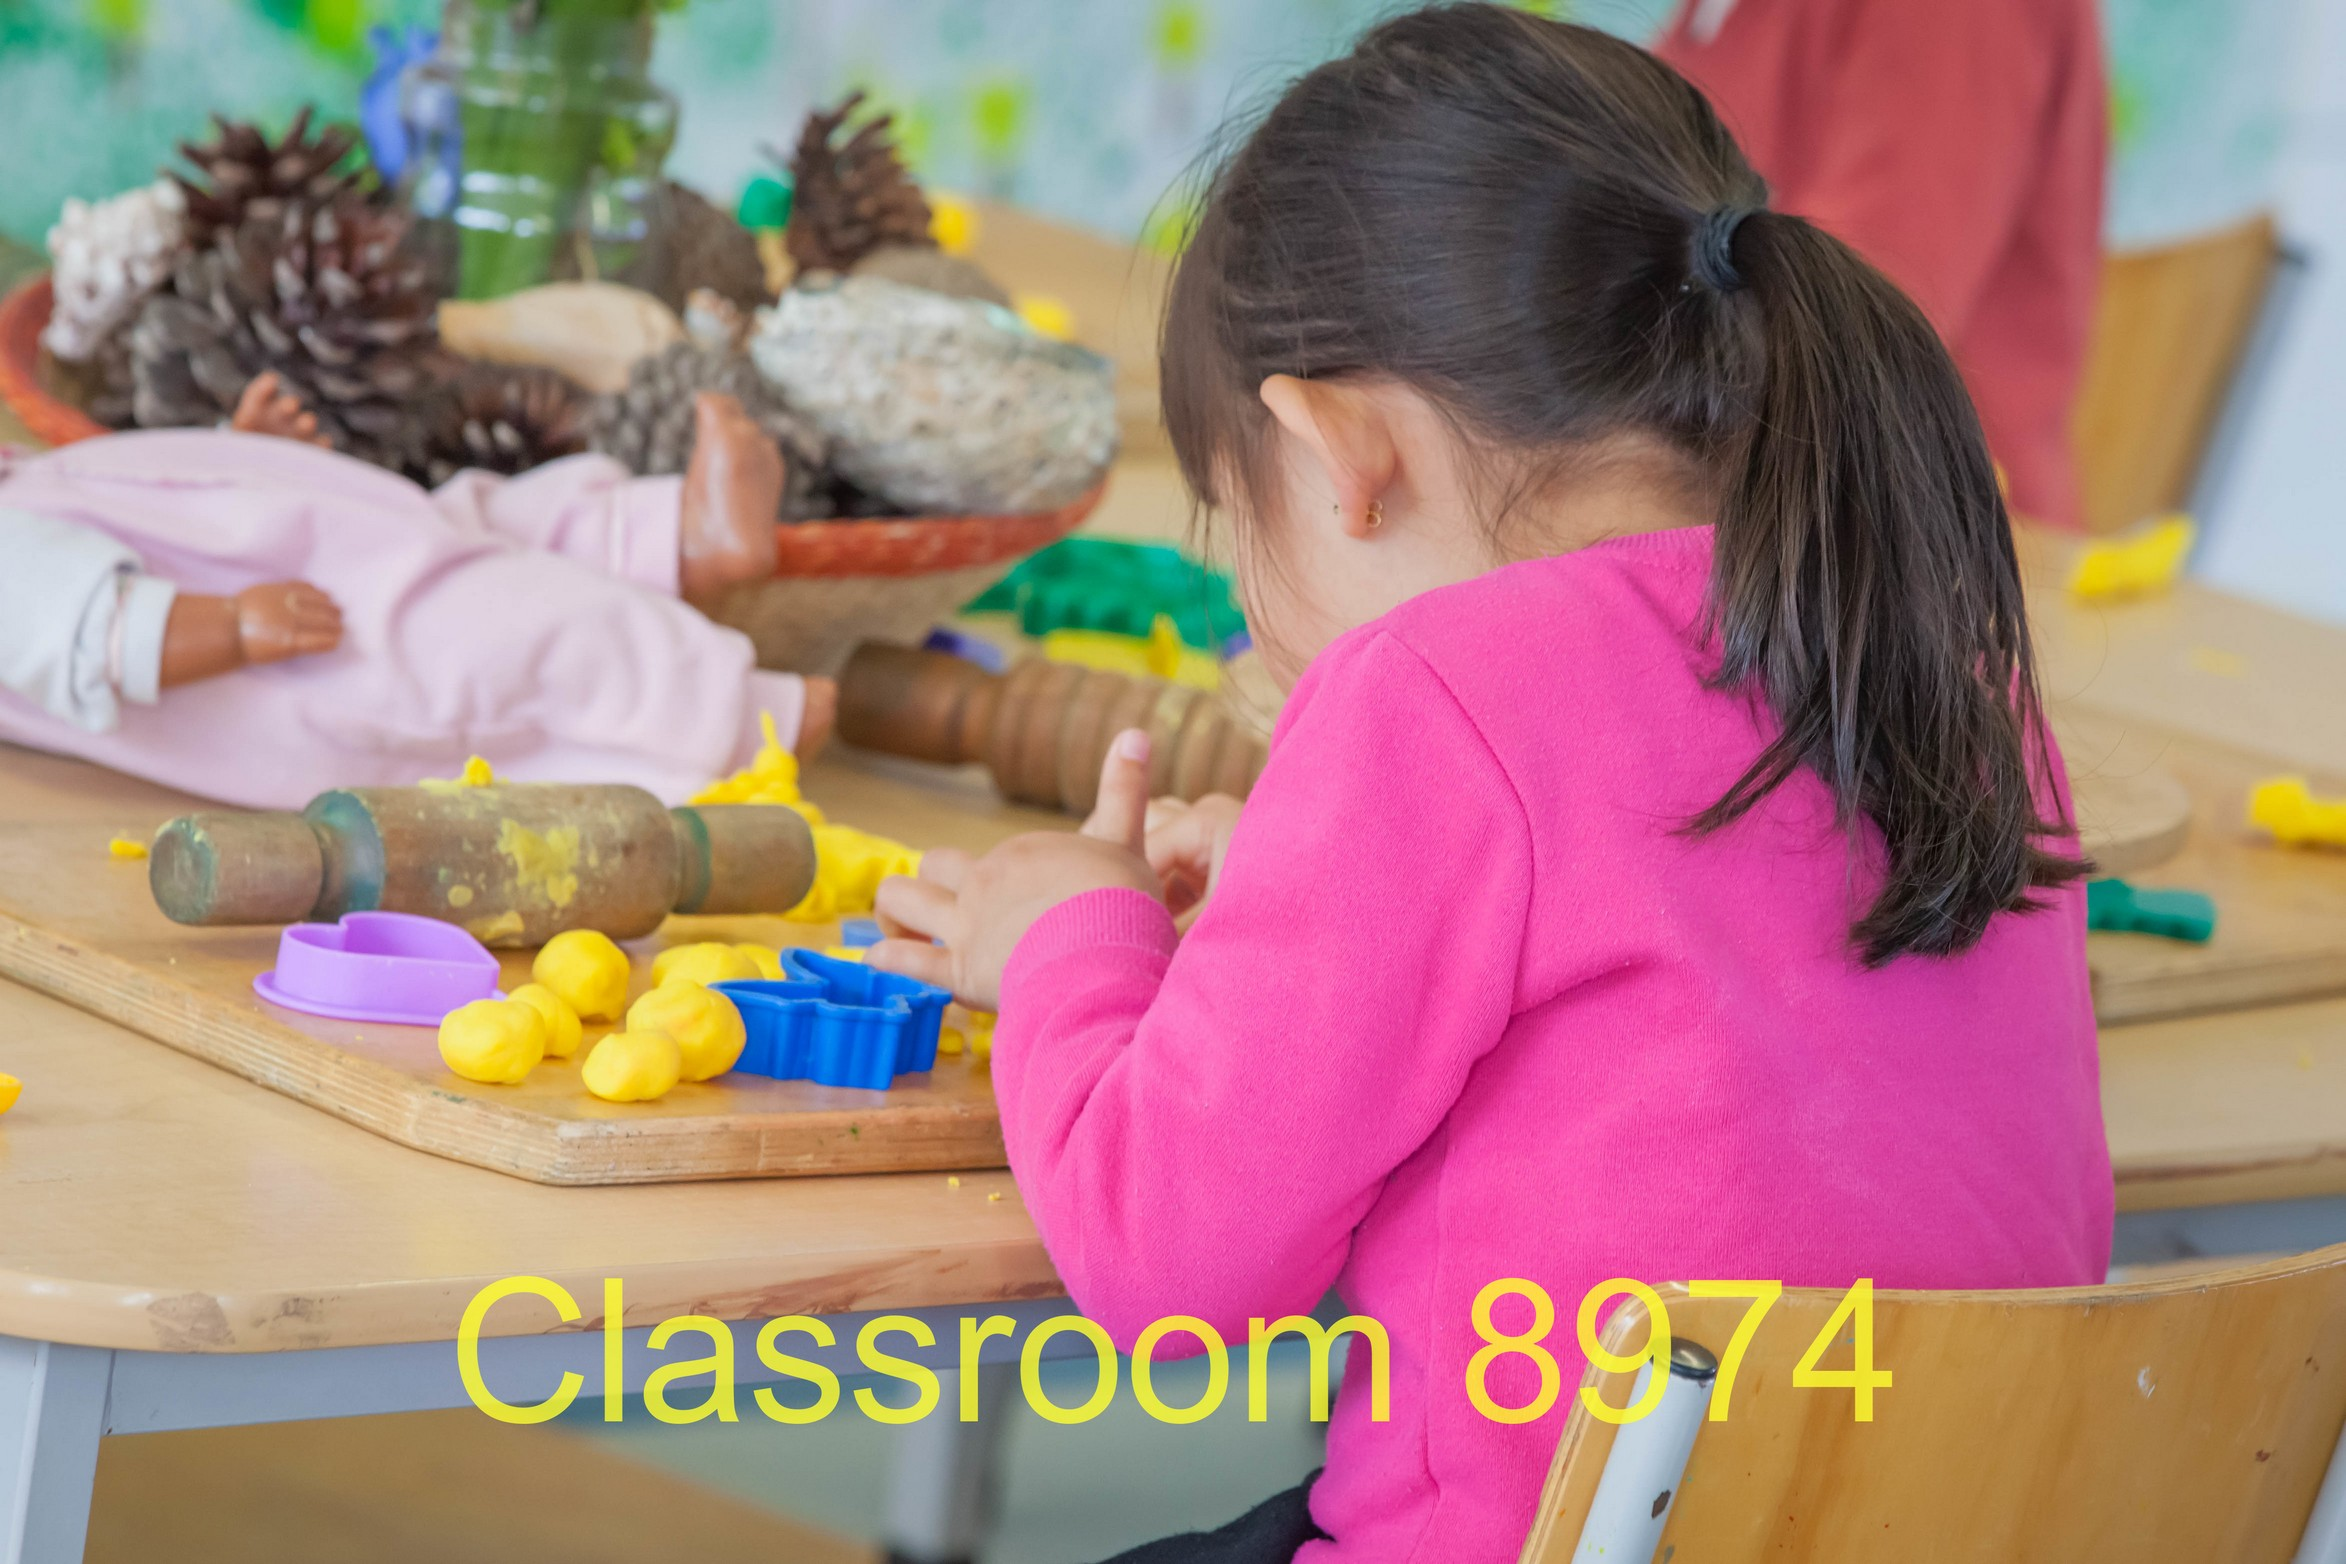 Classroom 8974